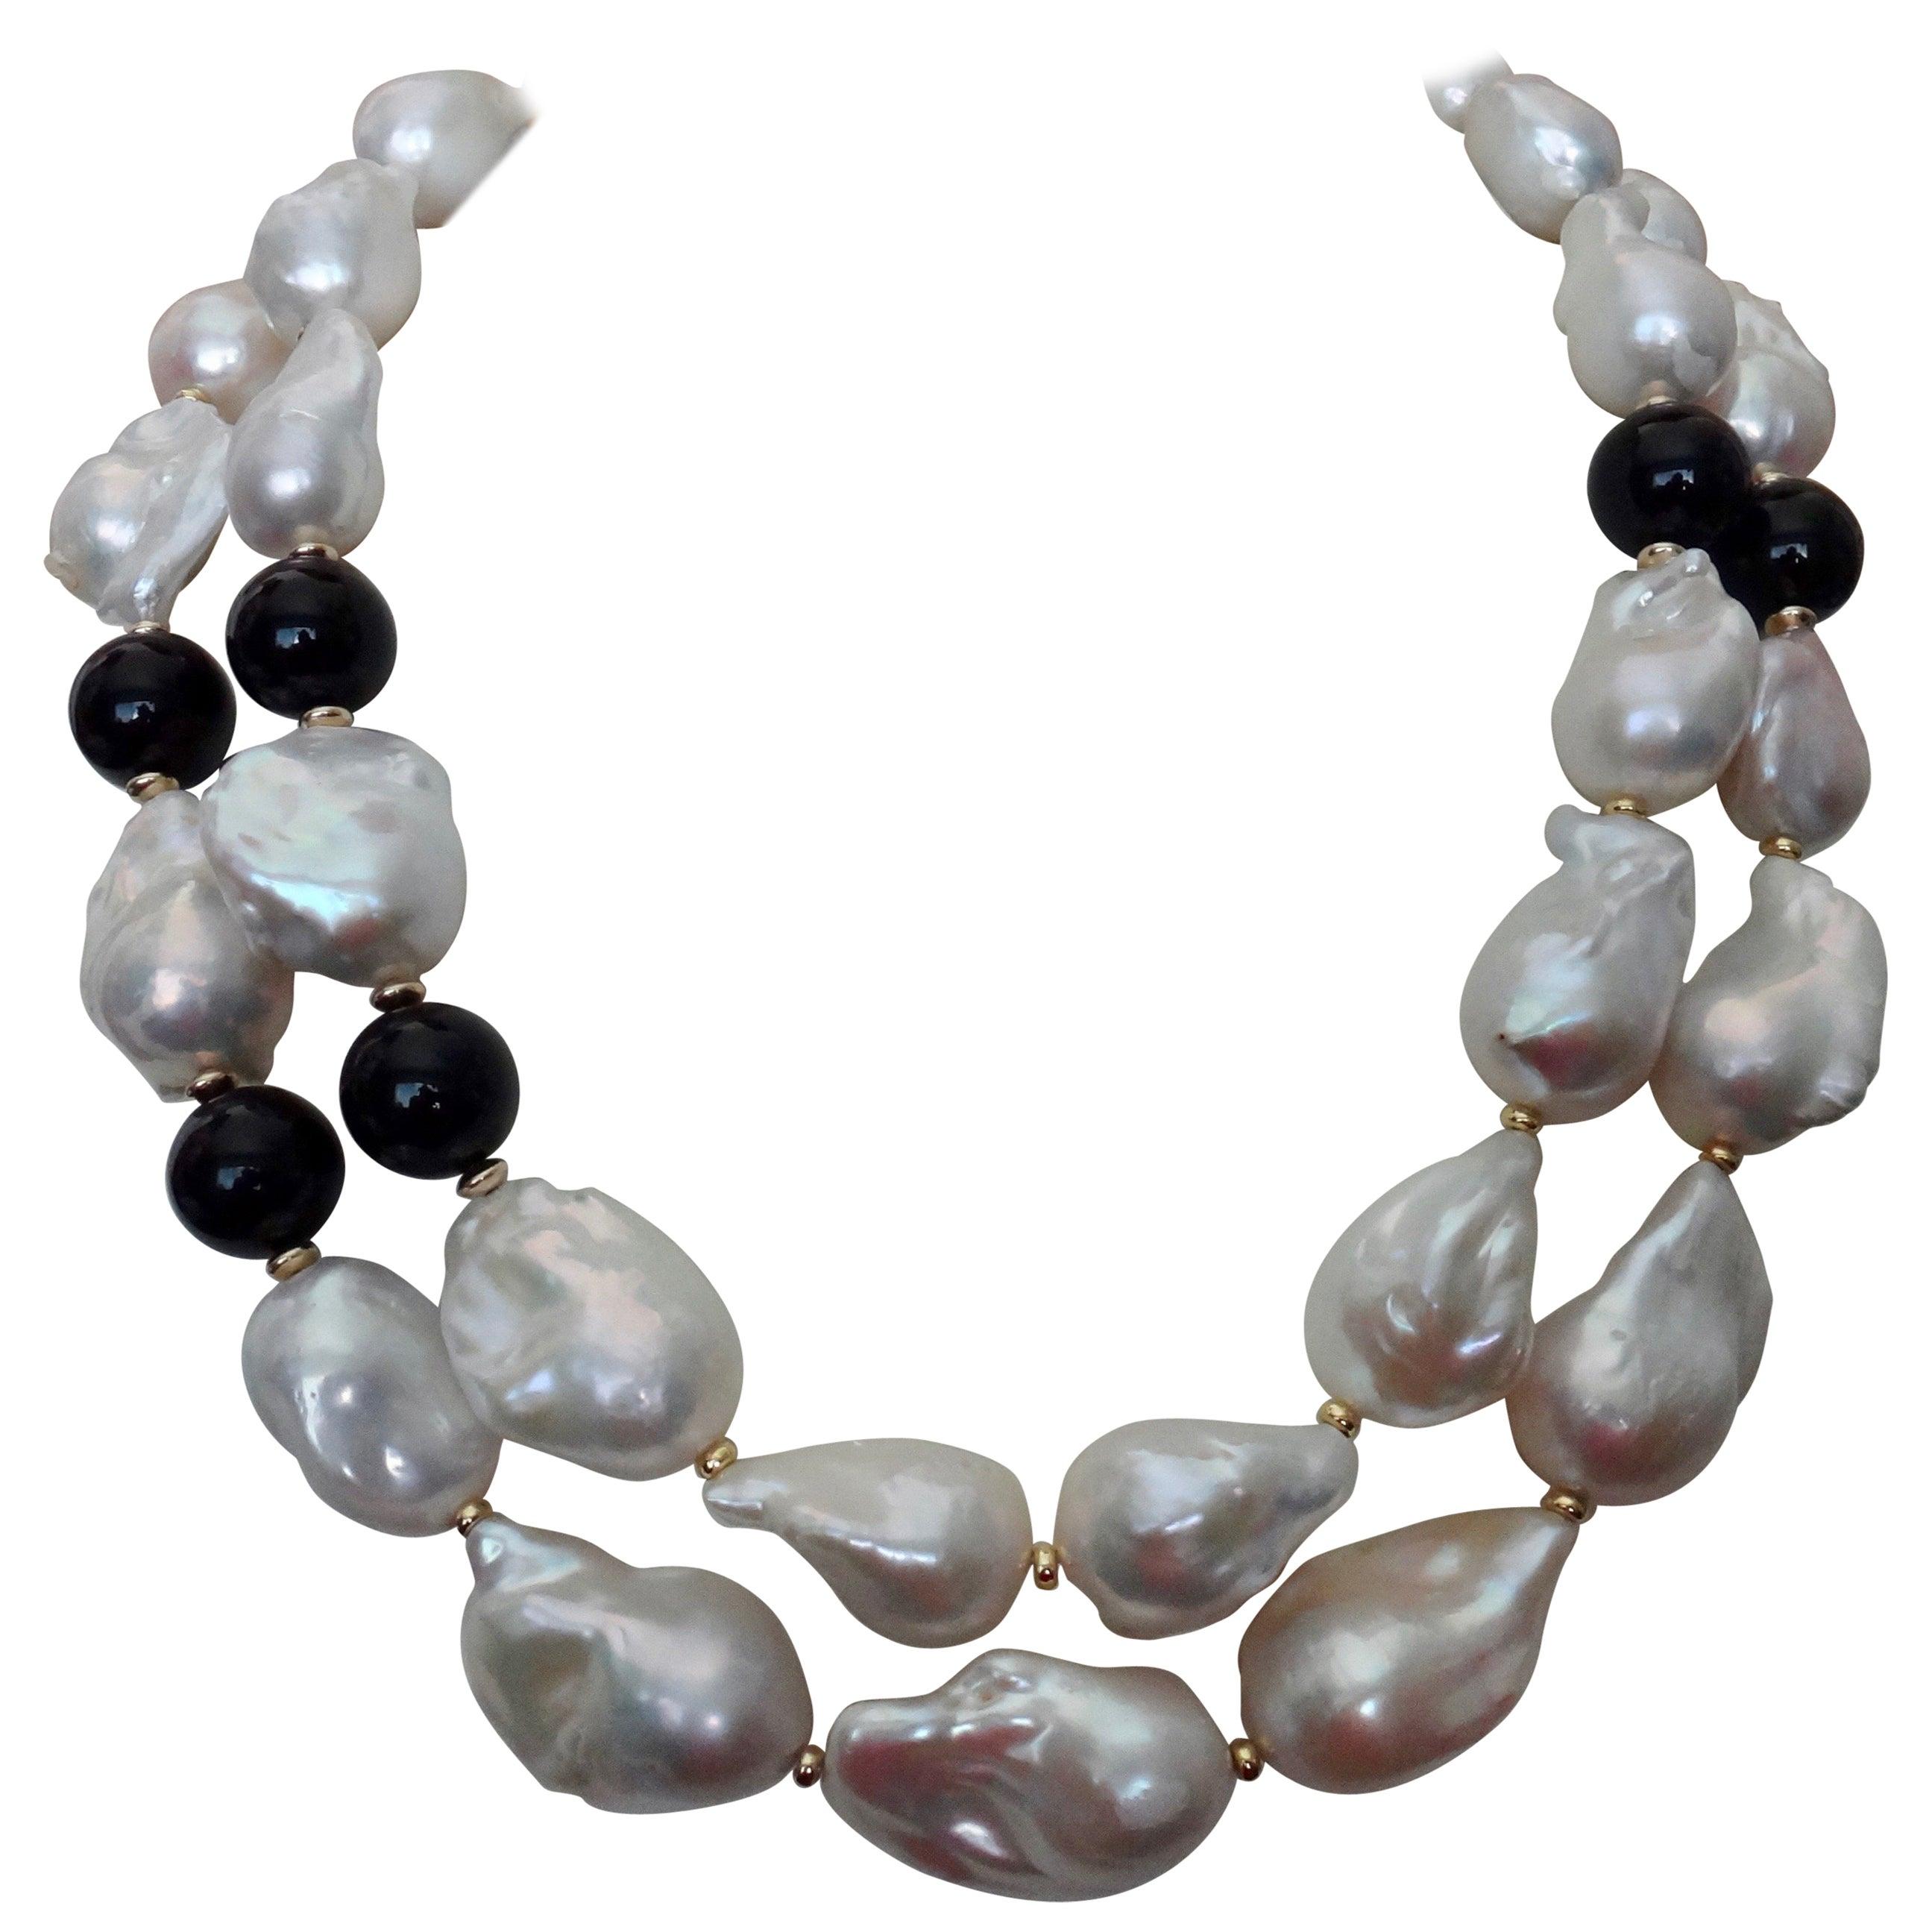 Michael Kneebone Double Strand Baroque Pearl Black Onyx Necklace